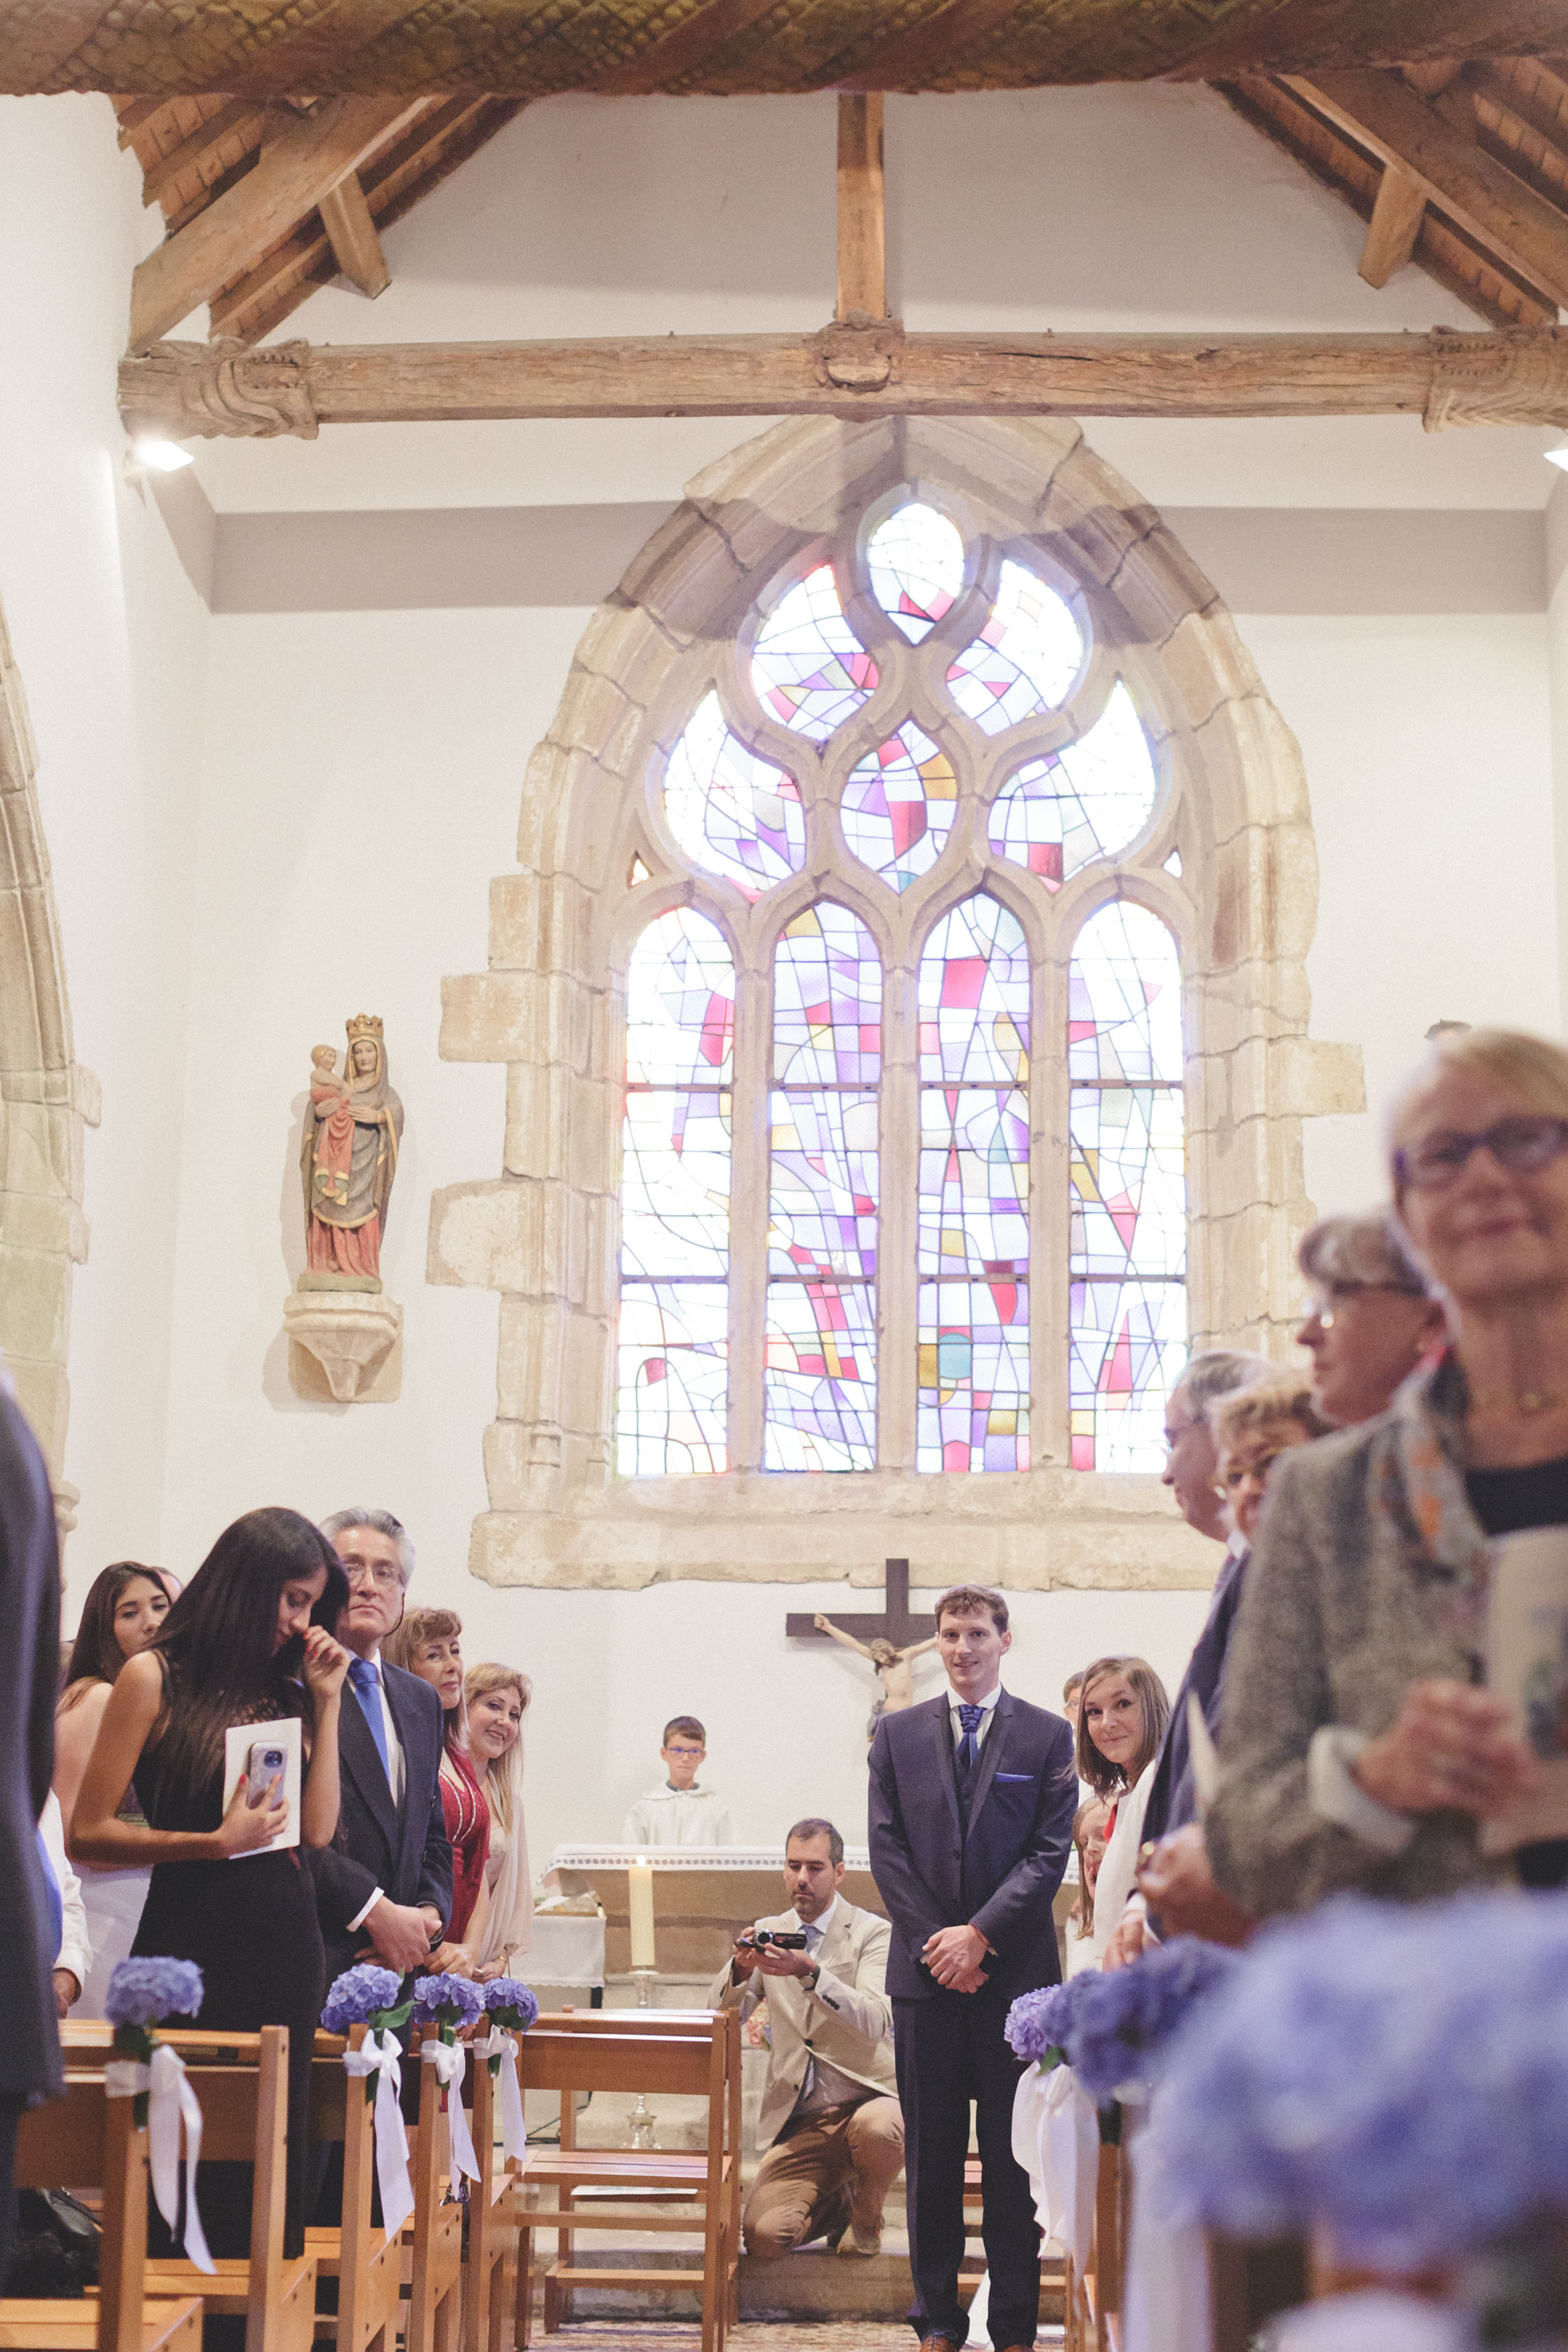 Photographie - Mariage - Bretagne - Finistere - Morbihan - Lilian Vezin Photographie (12)